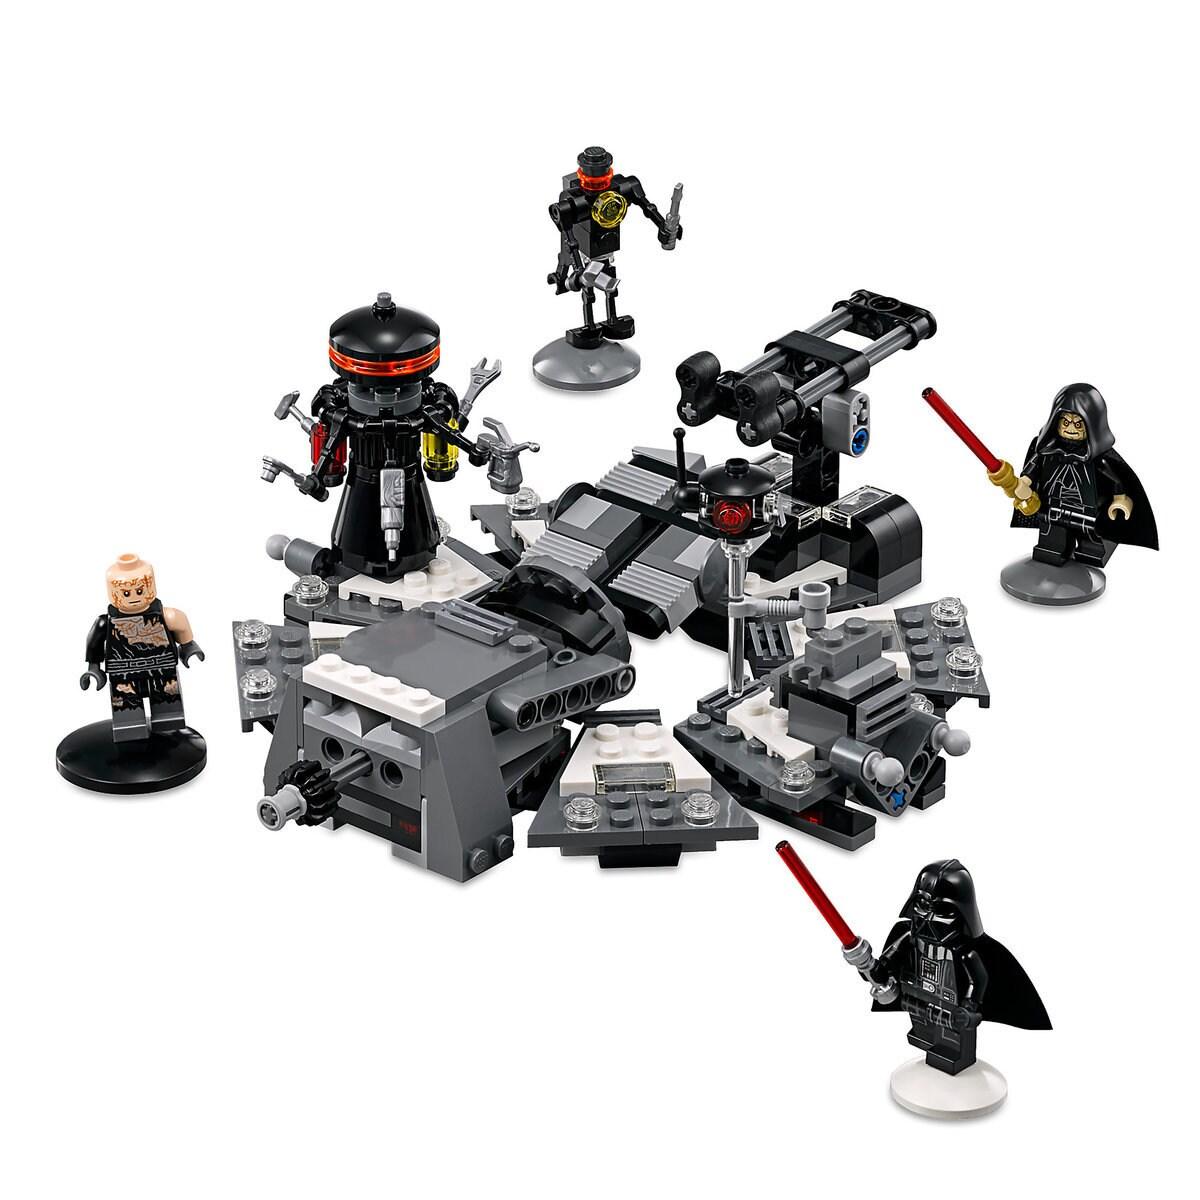 Transformation Star Playset By Darth Wars Vader Lego QCrdsth